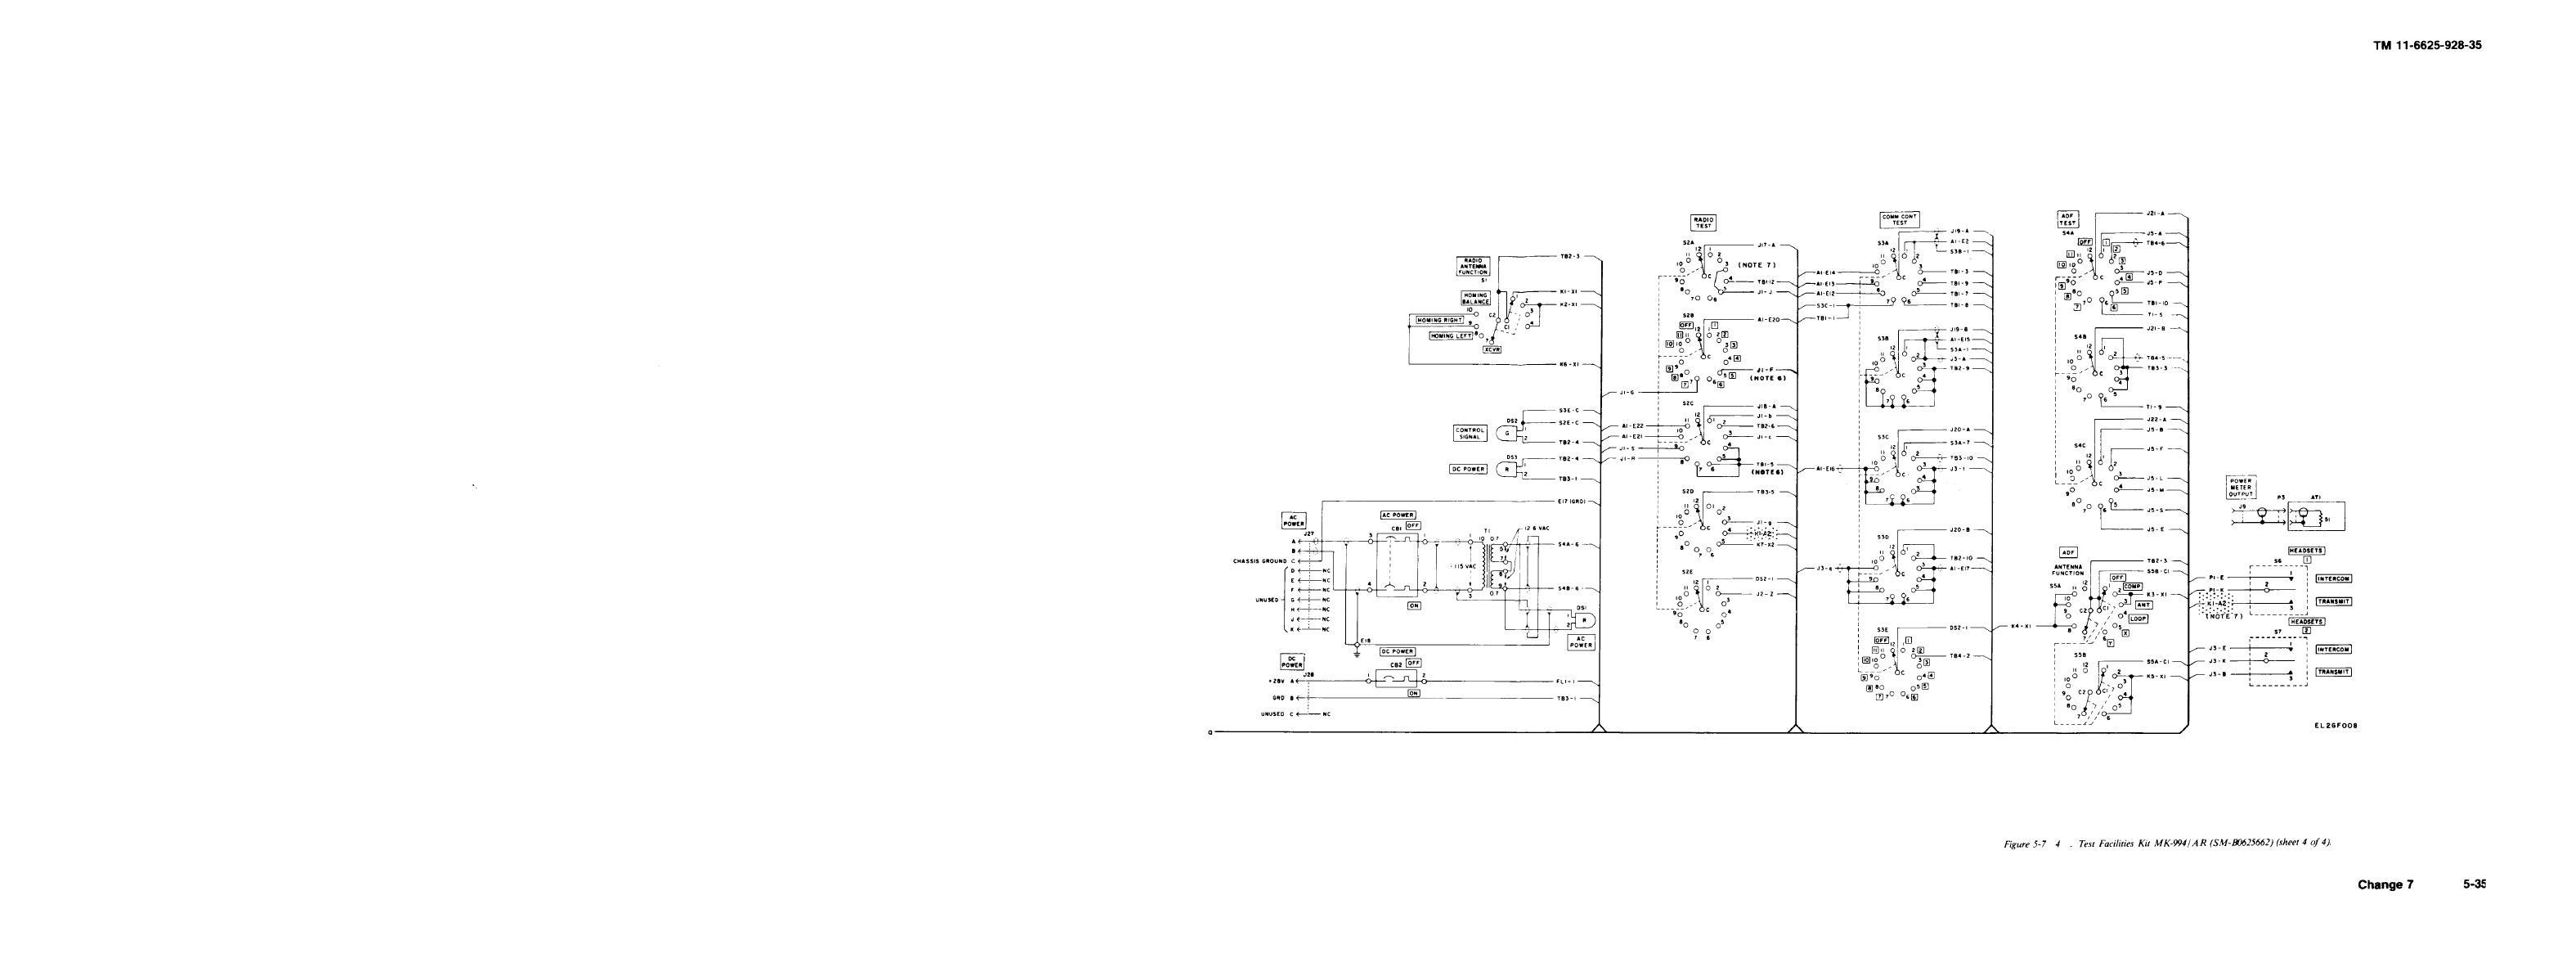 Figure 5-7. Test Facilities Kit MK-994/AR (part No. SM-B